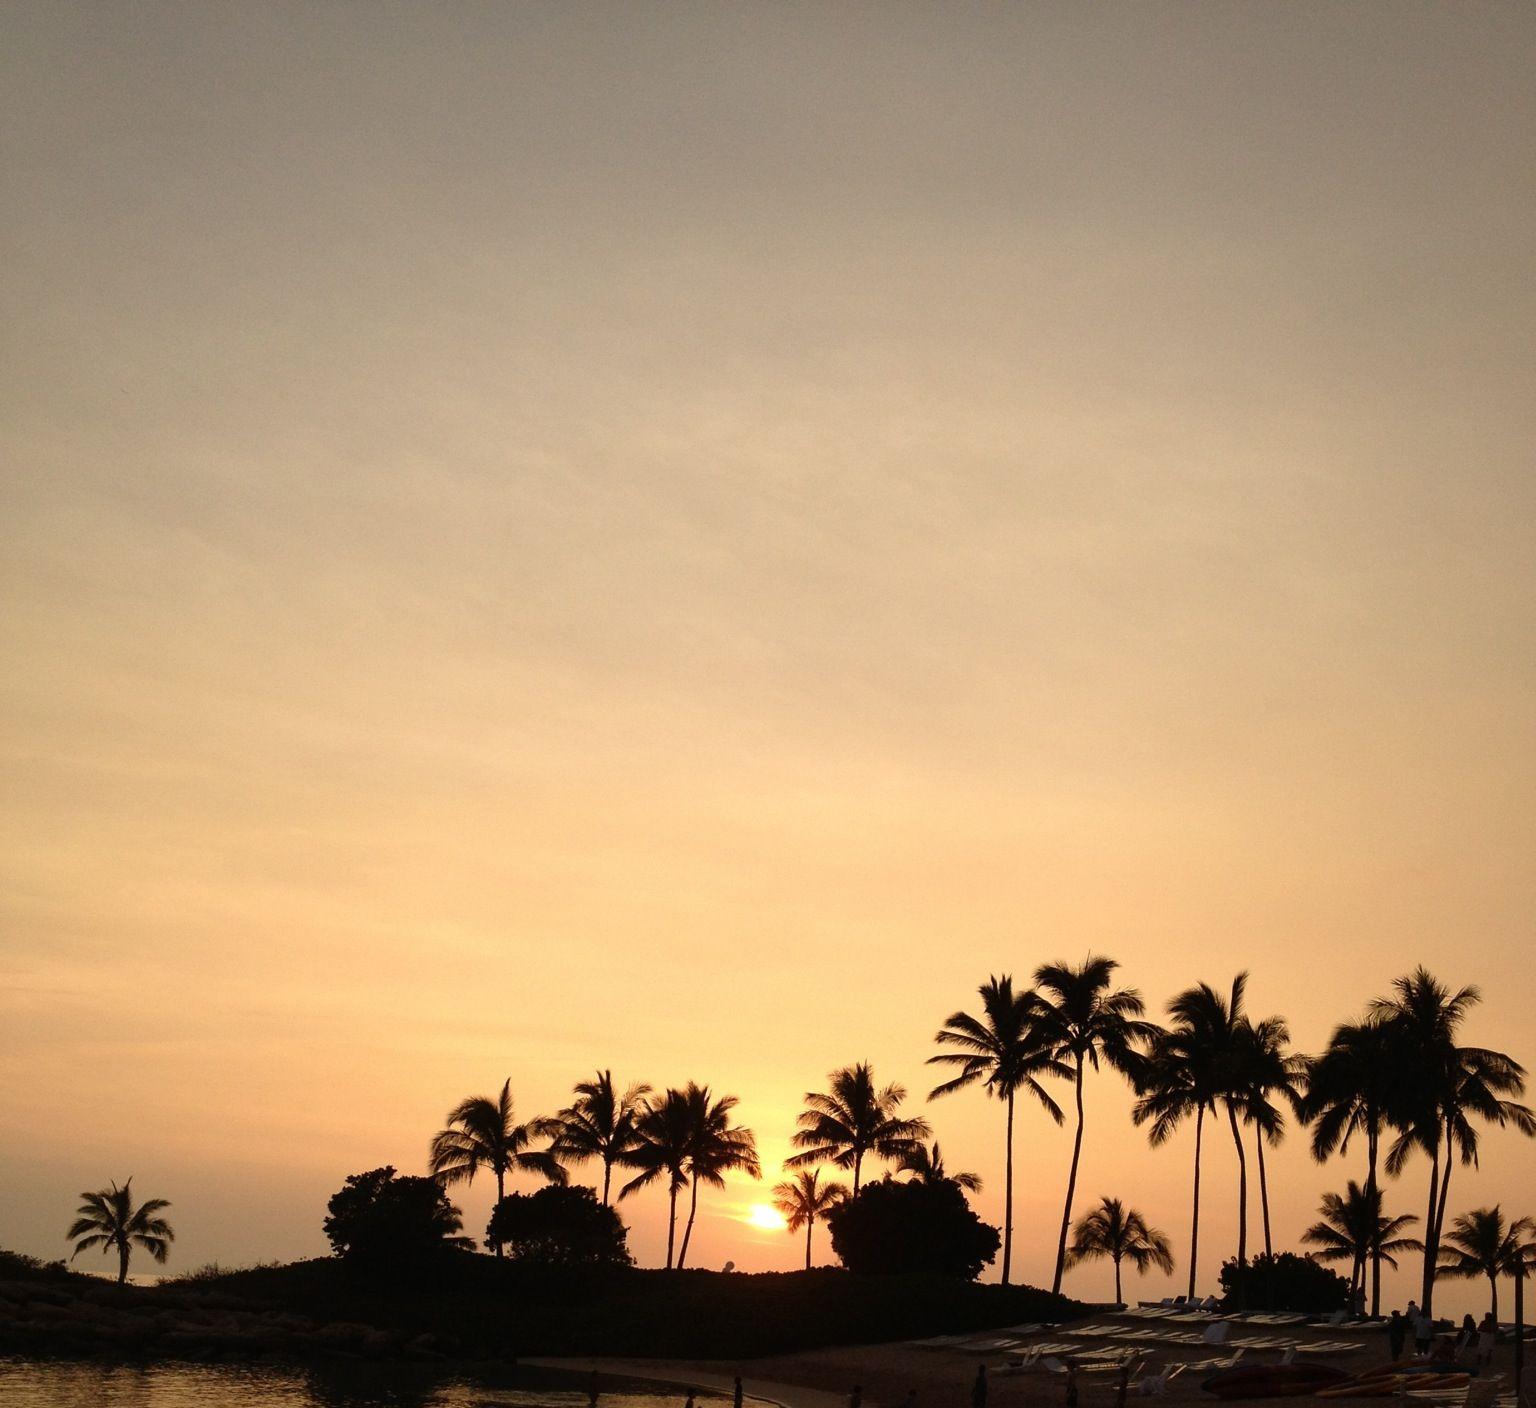 Oh how I miss Hawaii